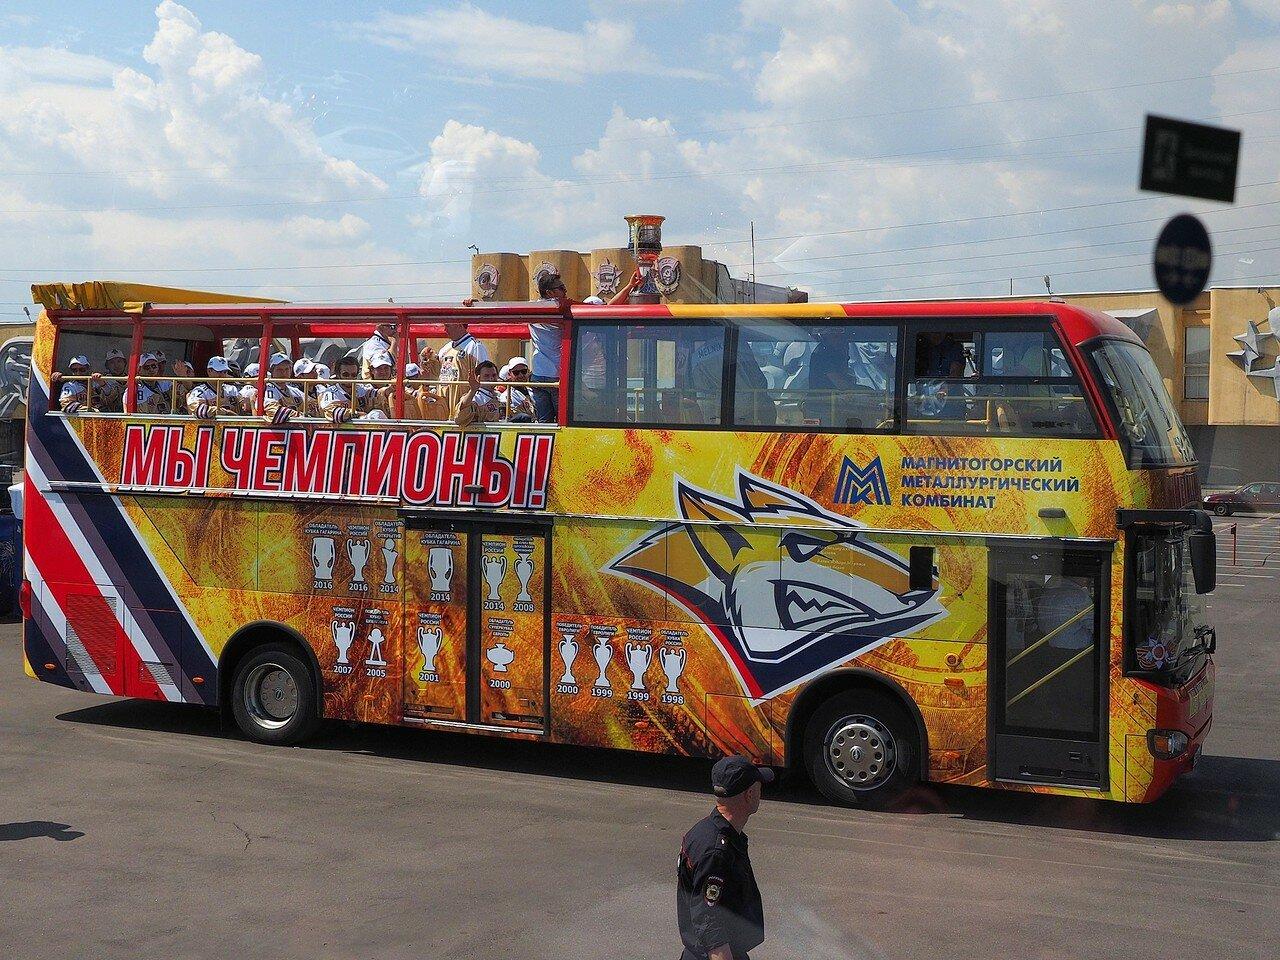 144Церемония чествования команды Металлург27.05.2016